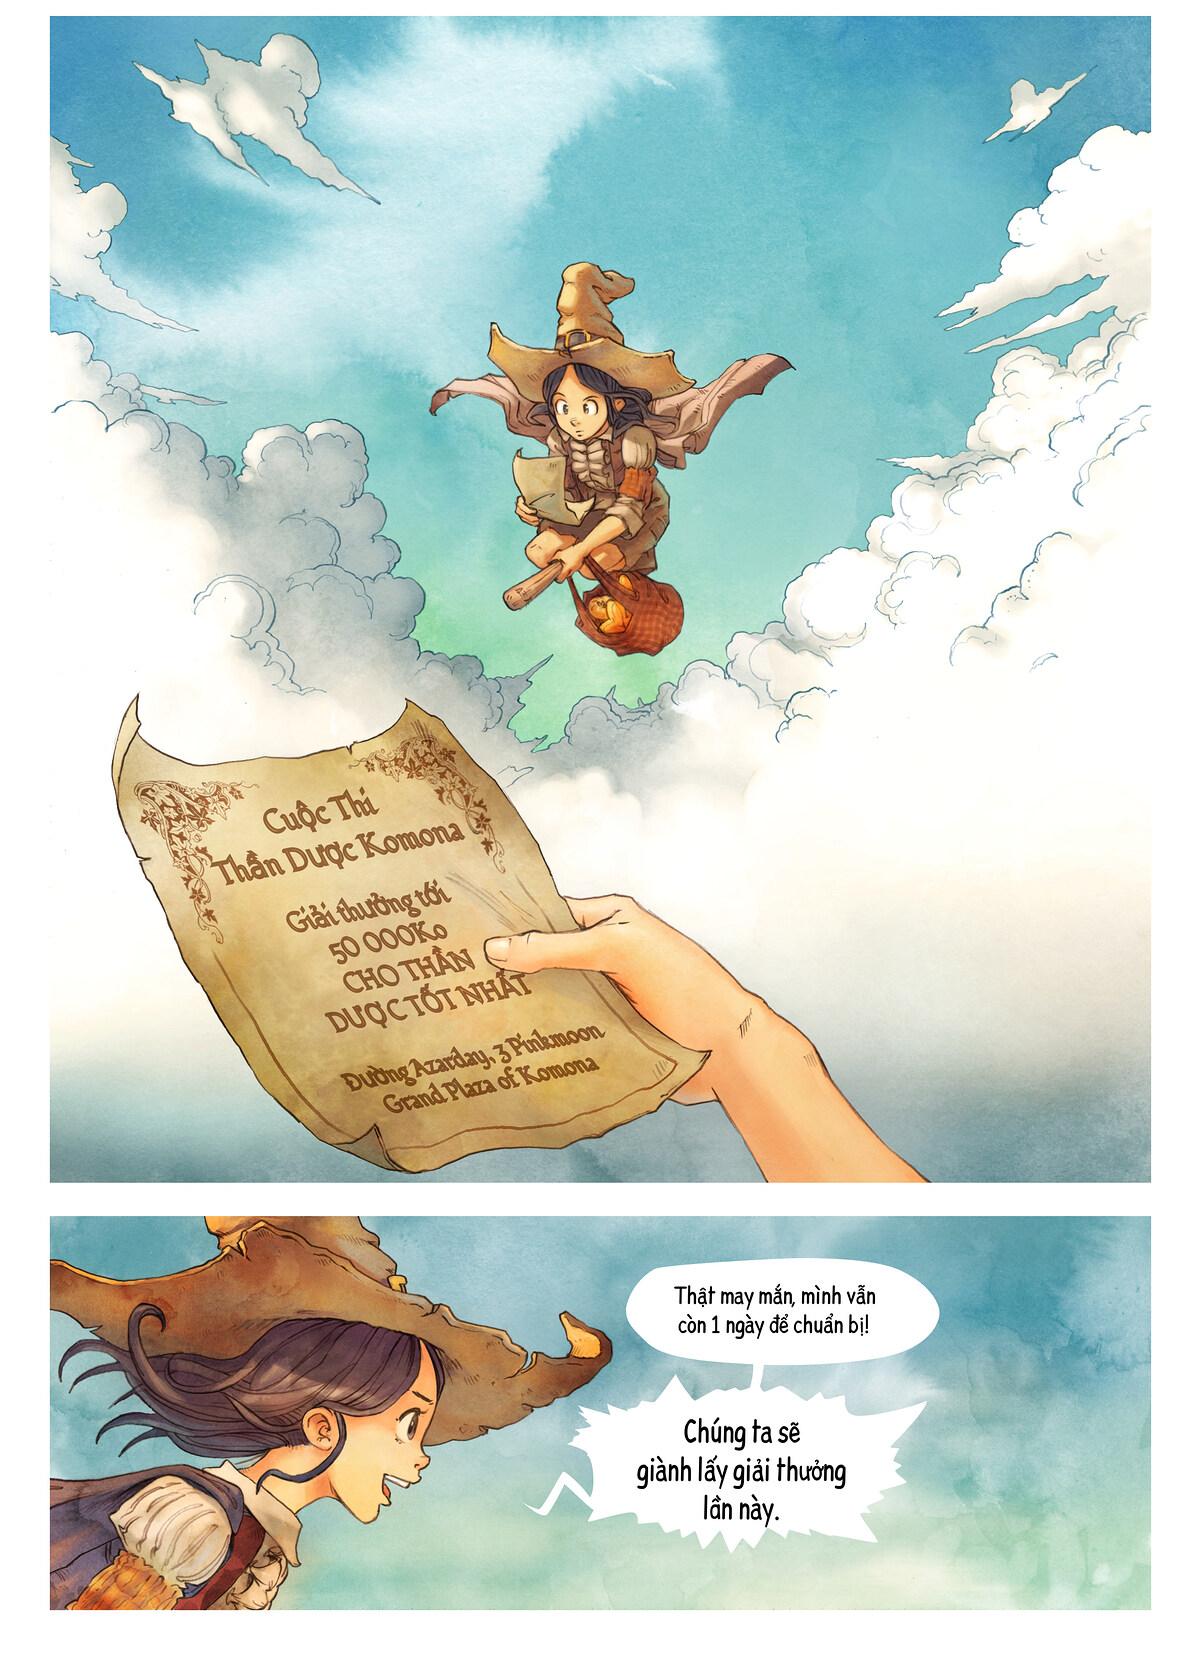 A webcomic page of Pepper&Carrot, Tập 3 [vi], trang 3